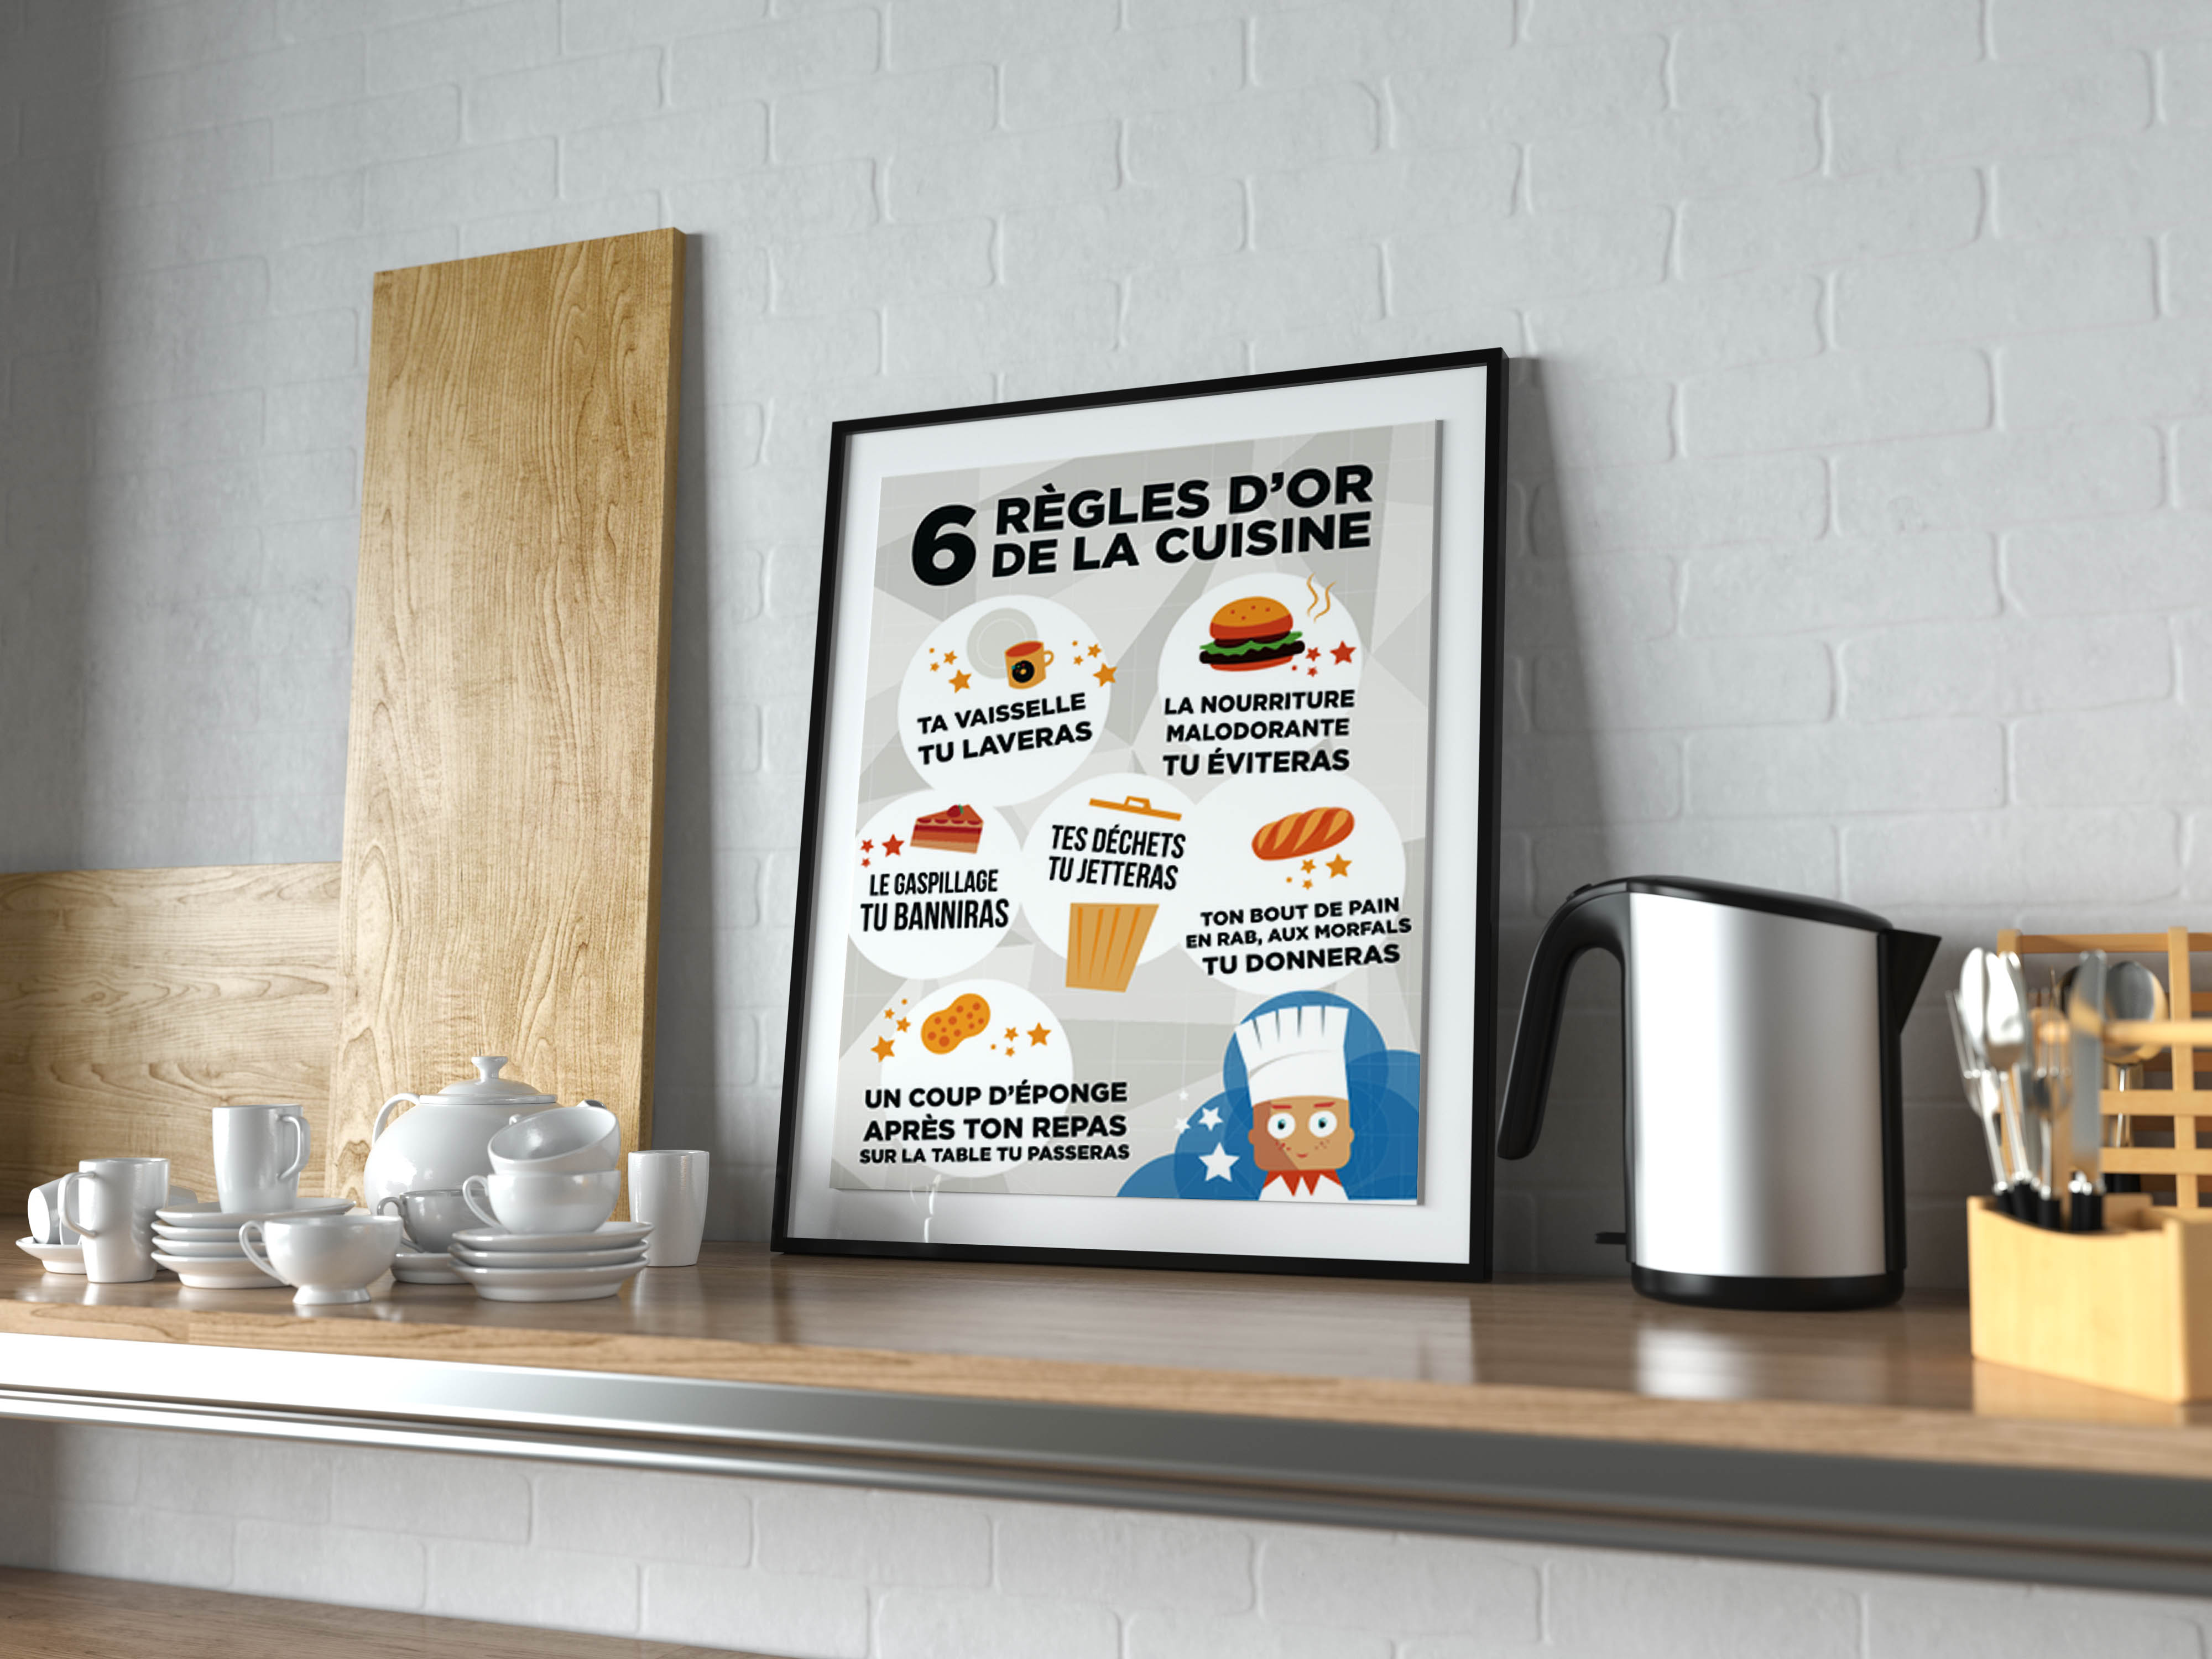 affiche règles d'or cuisine